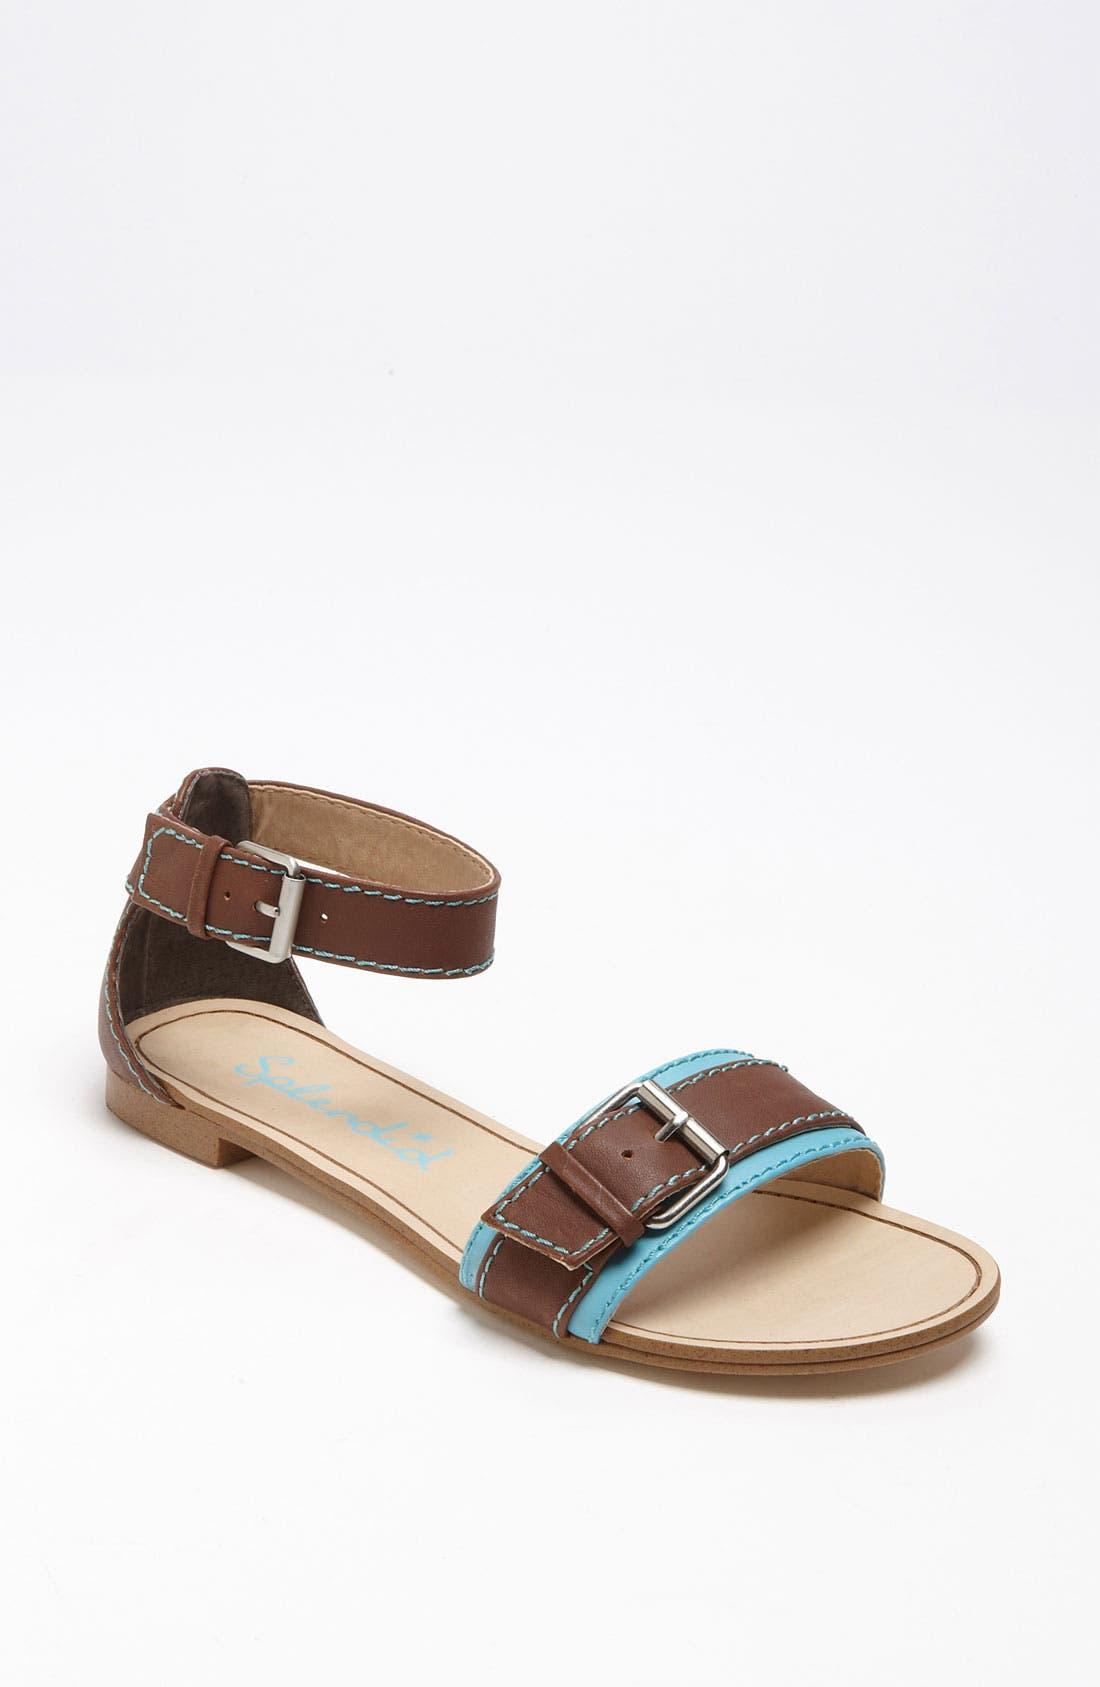 Main Image - Splendid 'Caribbean' Sandal